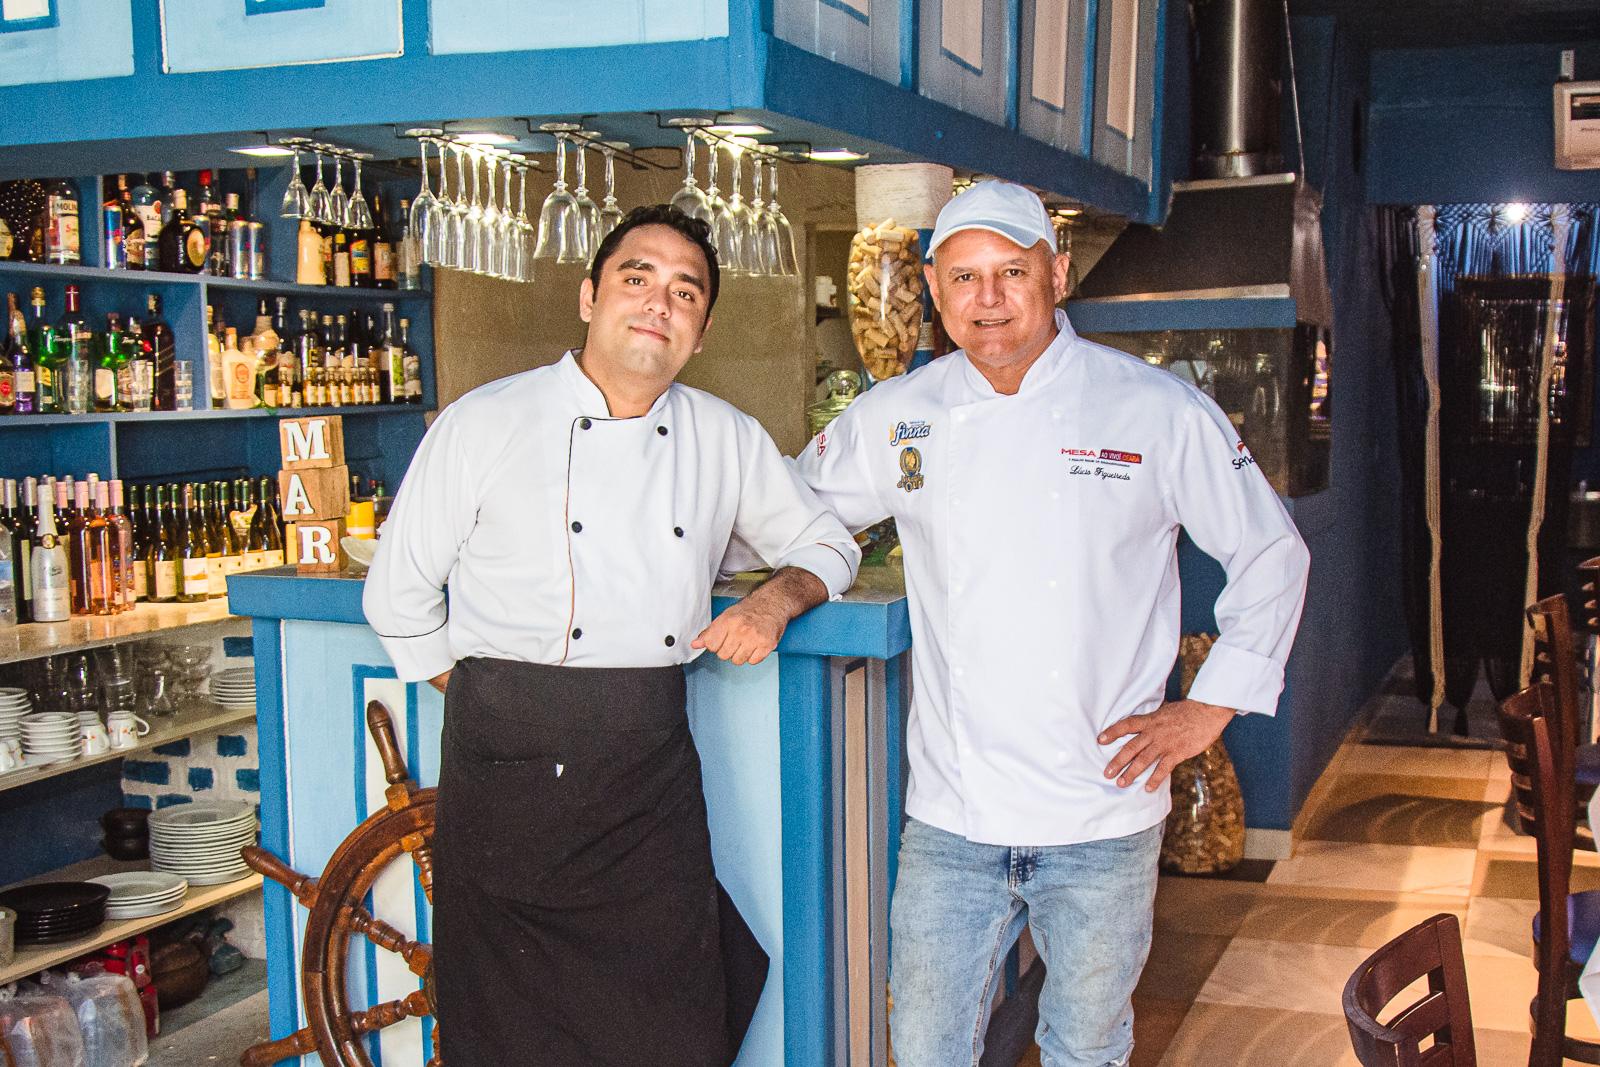 As delícias do VillaZulli vem surpreendendo os fãs de frutos do mar em Fortaleza